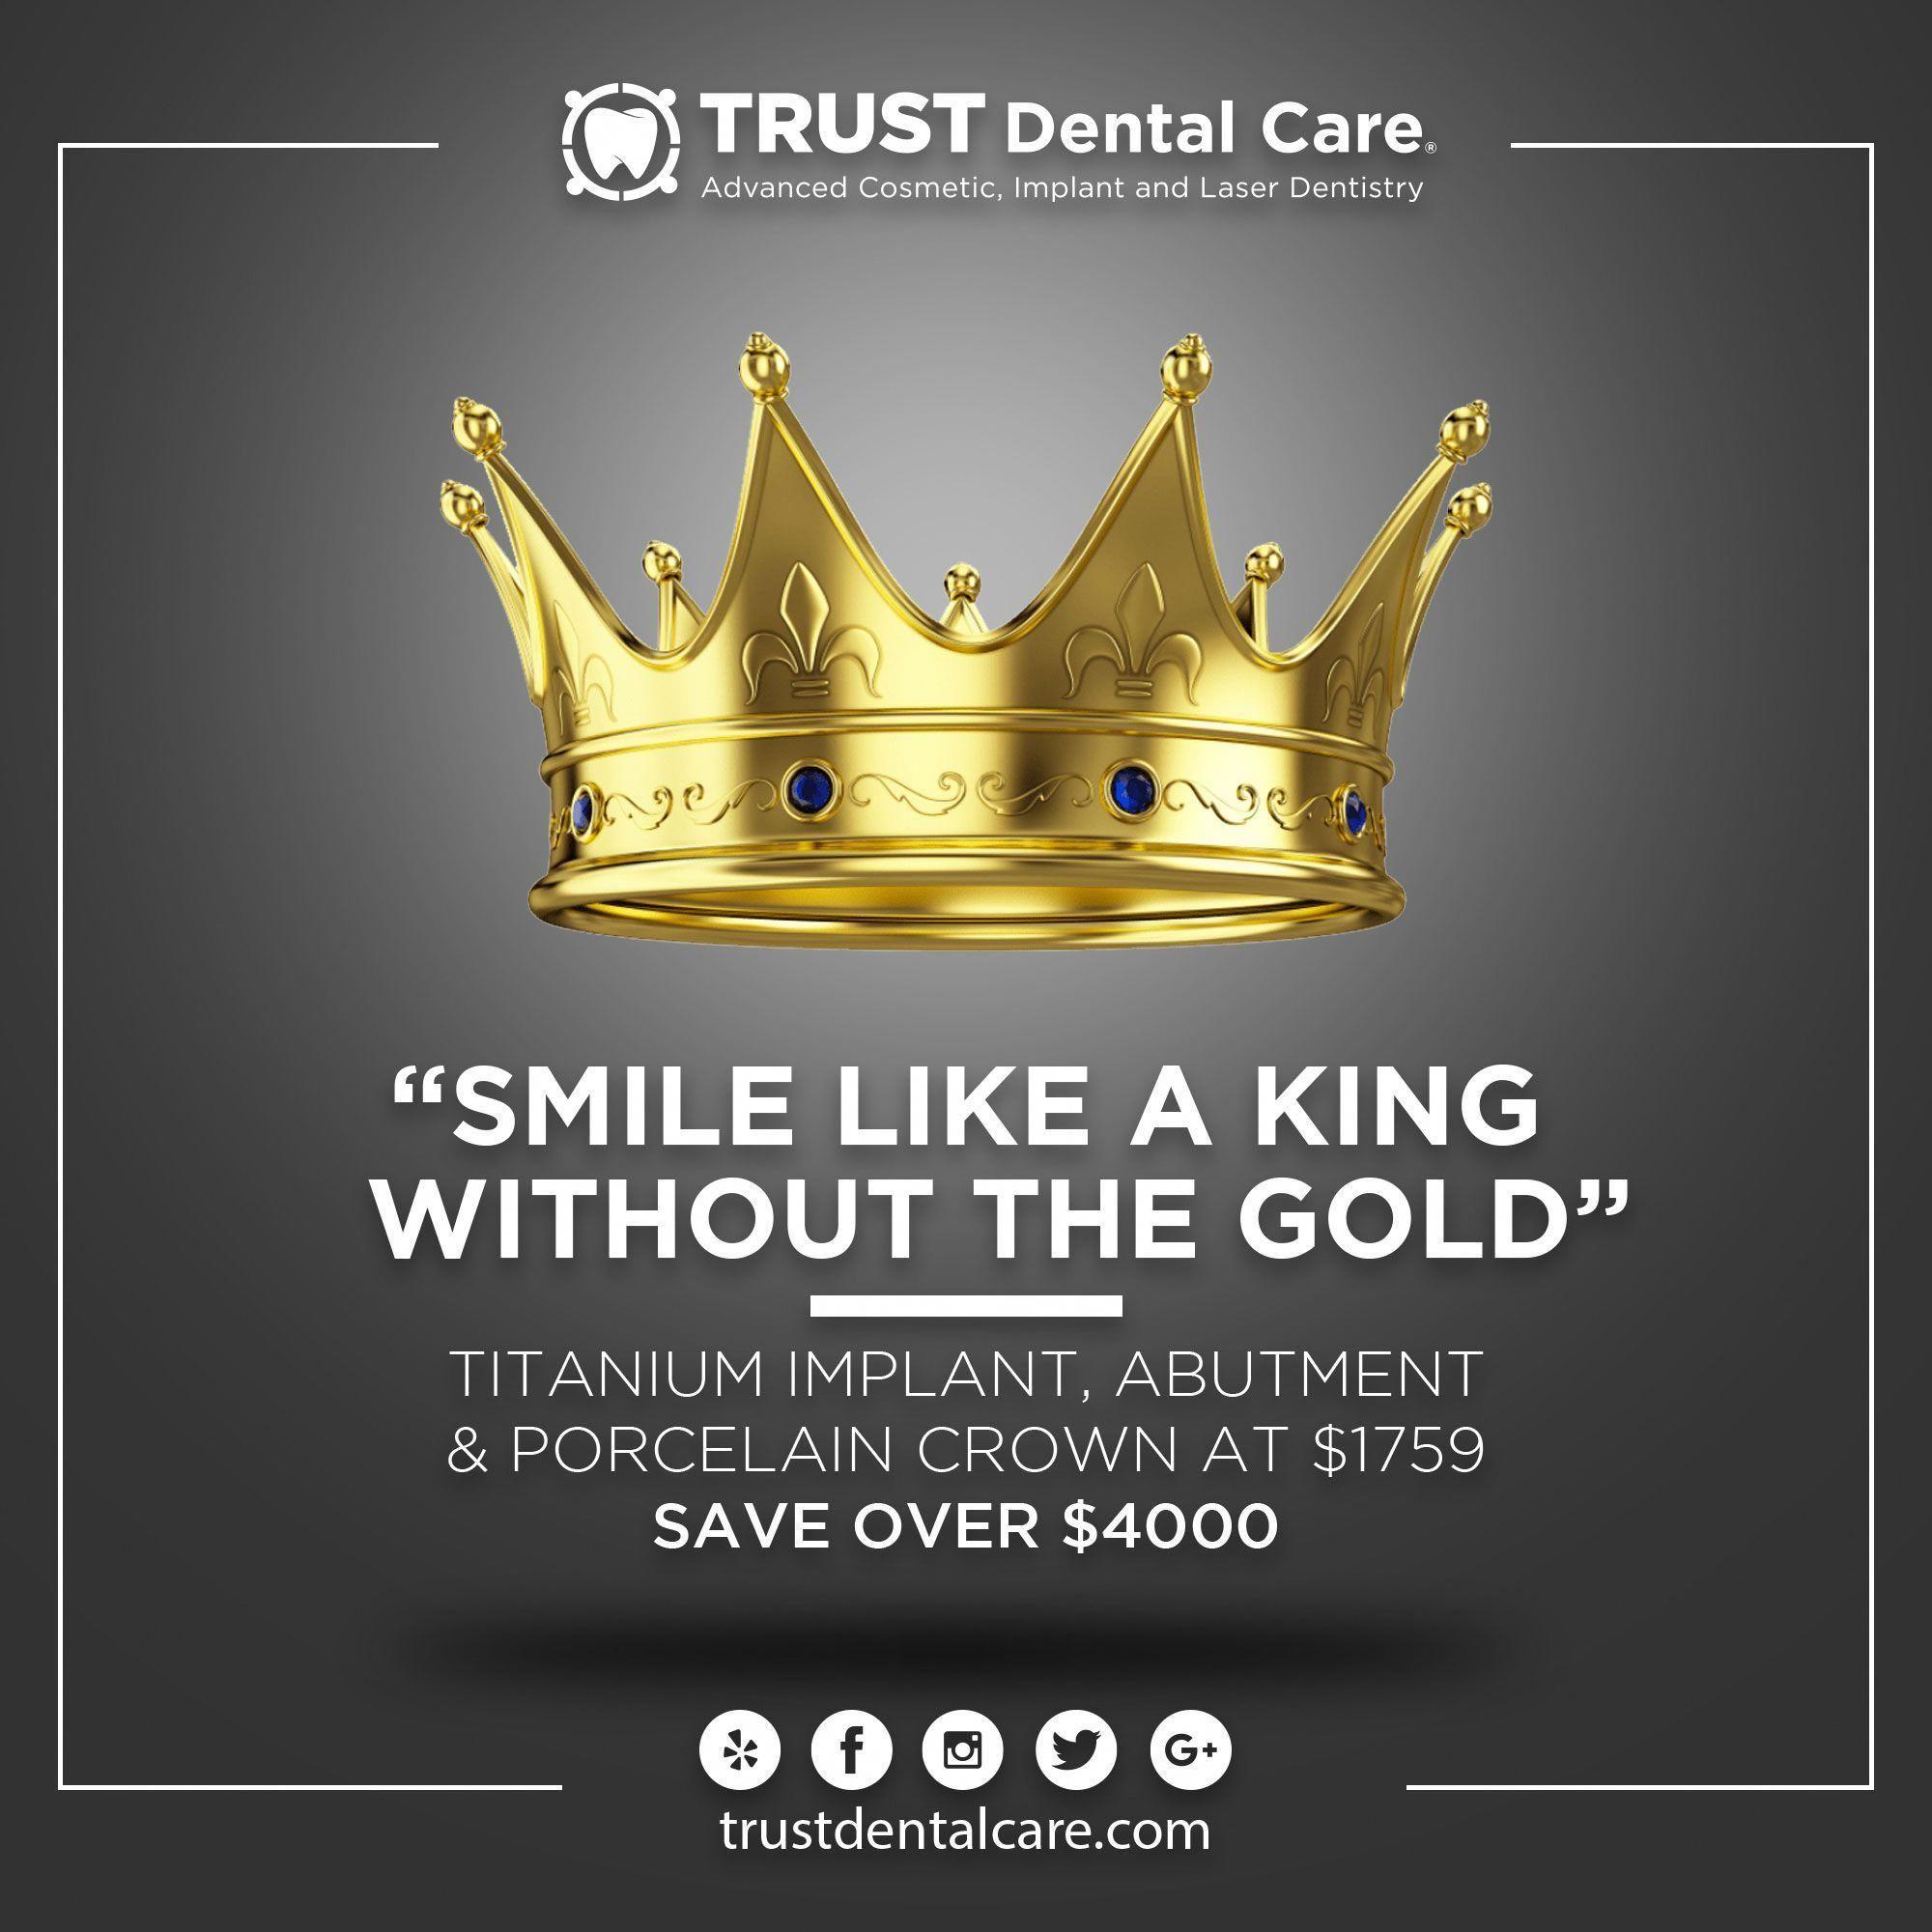 Rural Dental Crown Ceramics Toothfairyiscomingtonight Dentalcrownsbeforeandafterbeautiful Dentalcrownroots In 2020 Dental Crowns Dental Porcelain Crowns